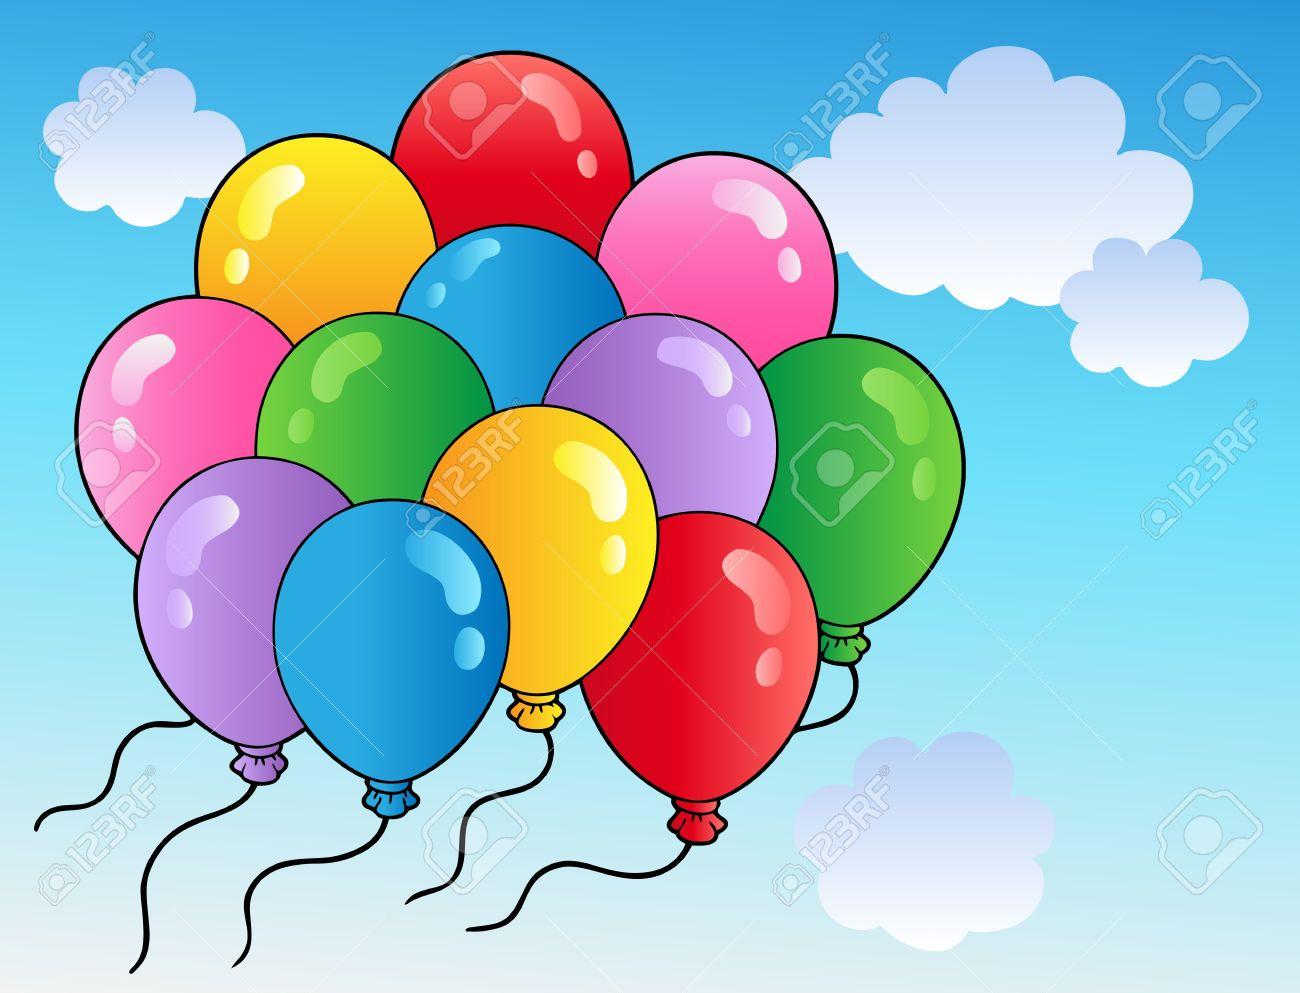 Blue sky with cartoon balloons 2 Stock Vector - 9199572